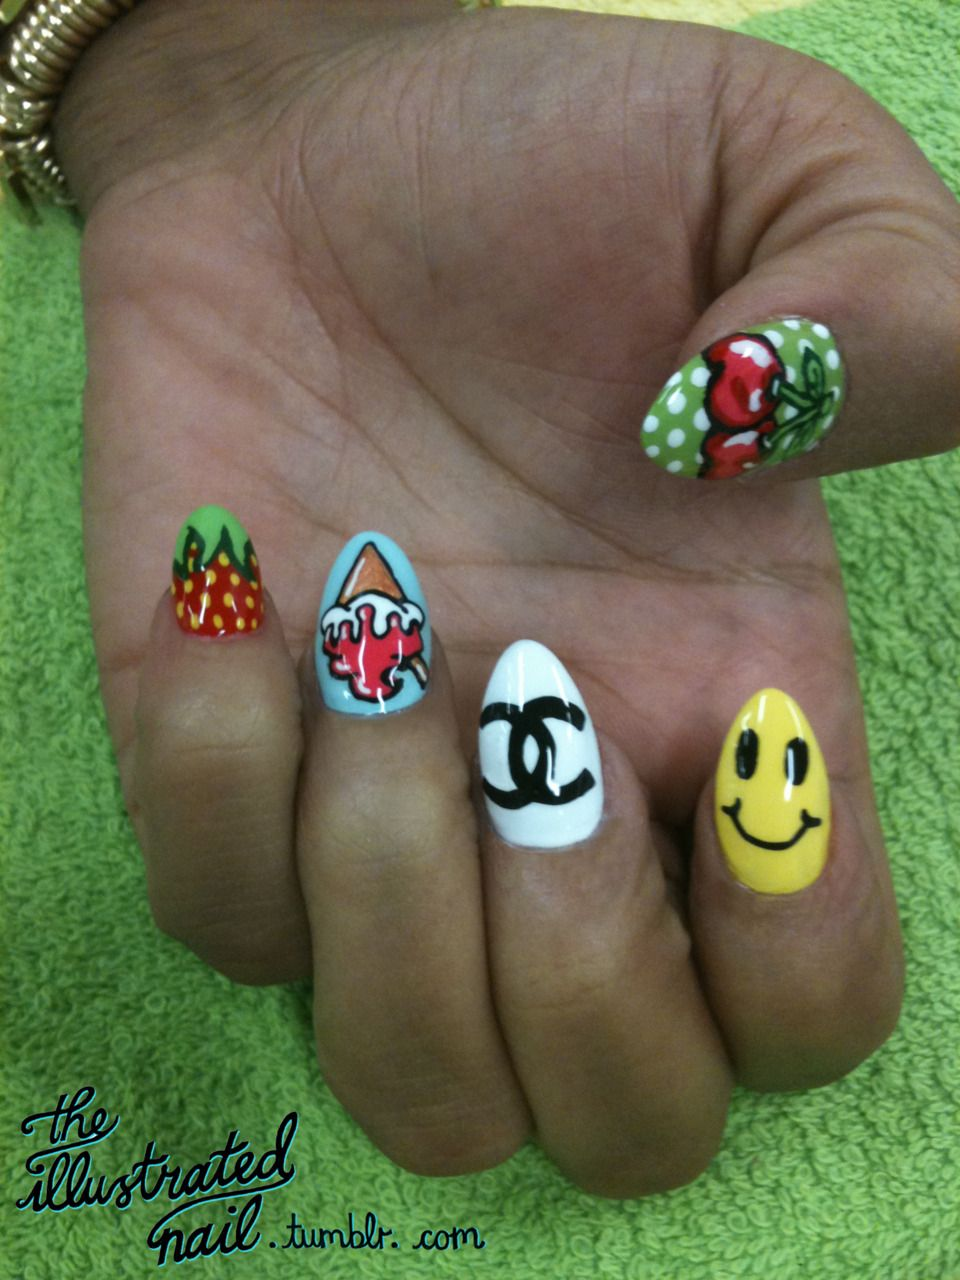 #fashion  #nails  #strawberry  #chanel  #smile  #cherry